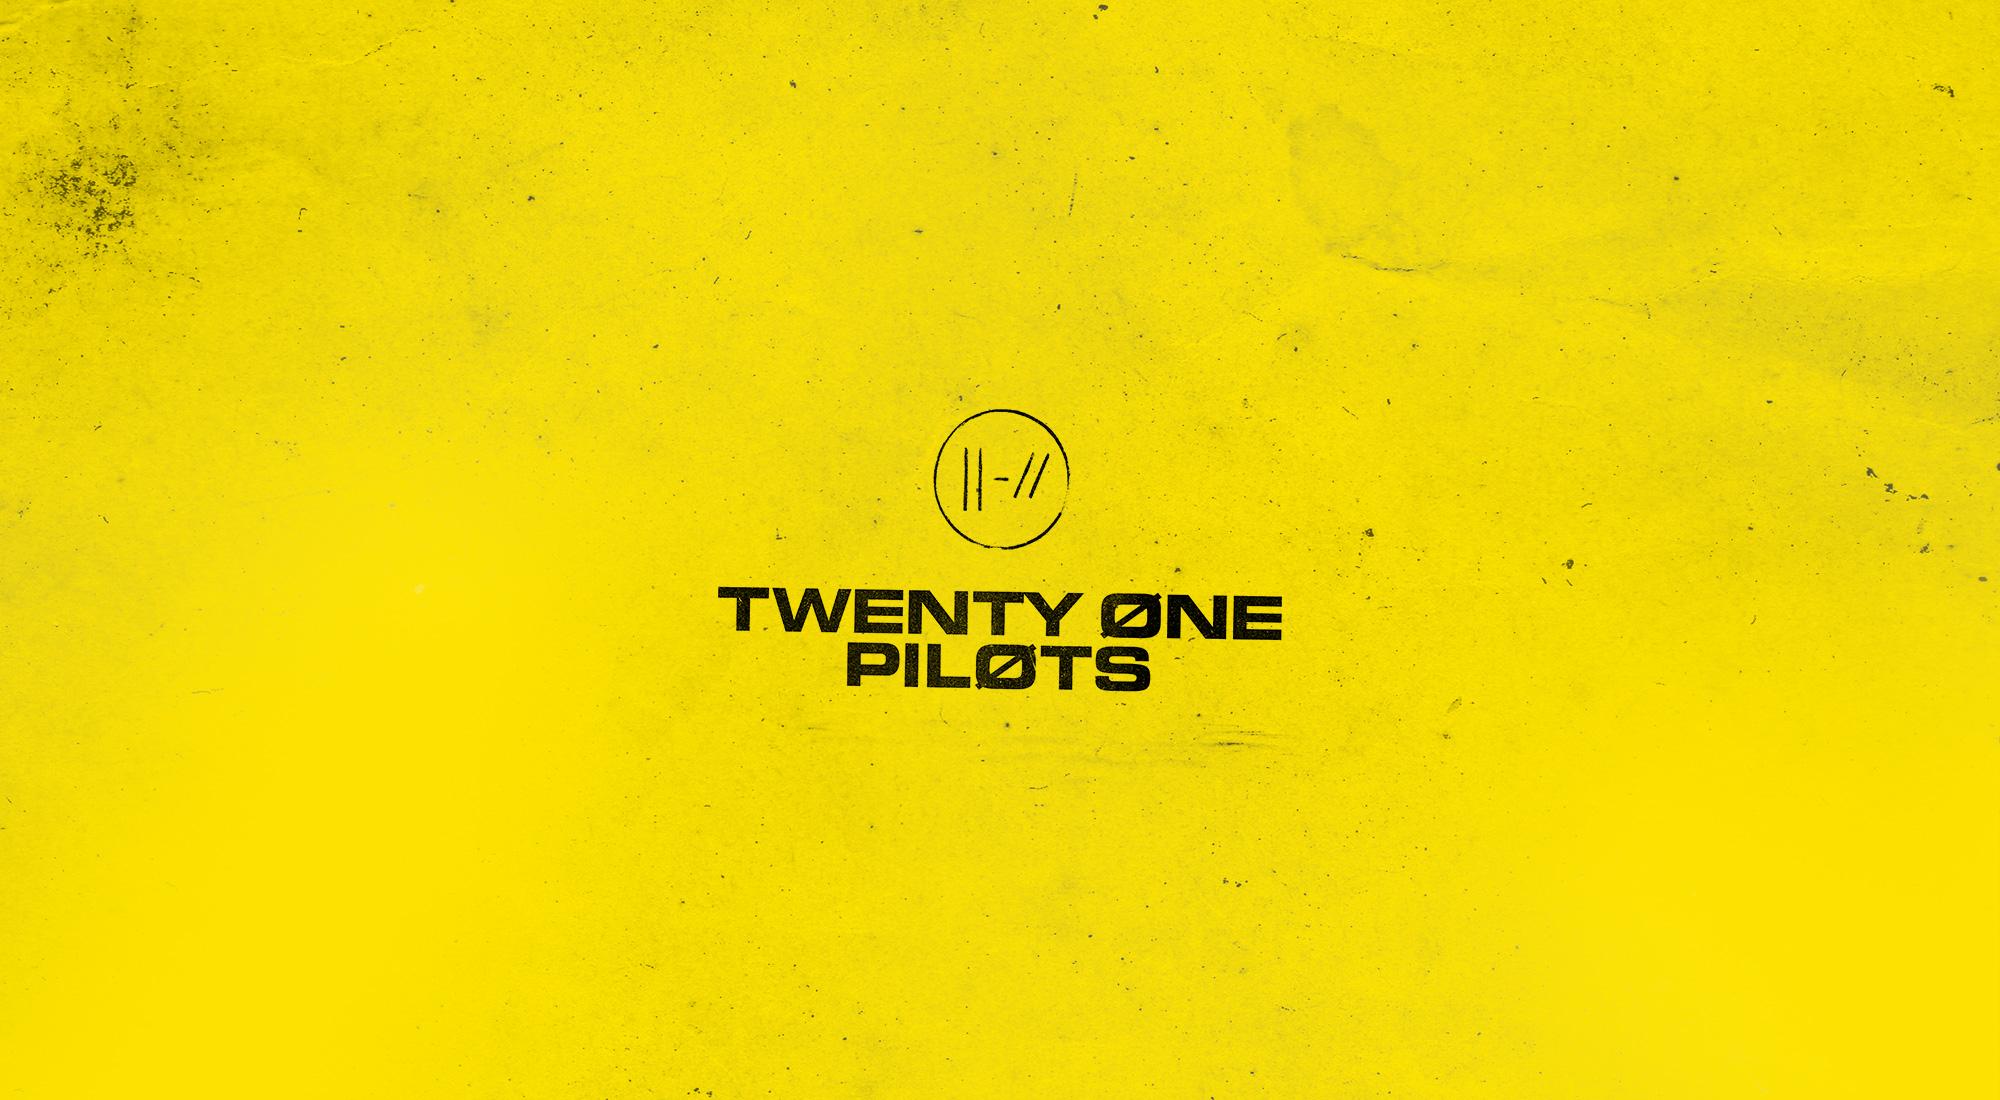 Twenty One Pilots yellow trench minimalism simple background yellow background 1474623